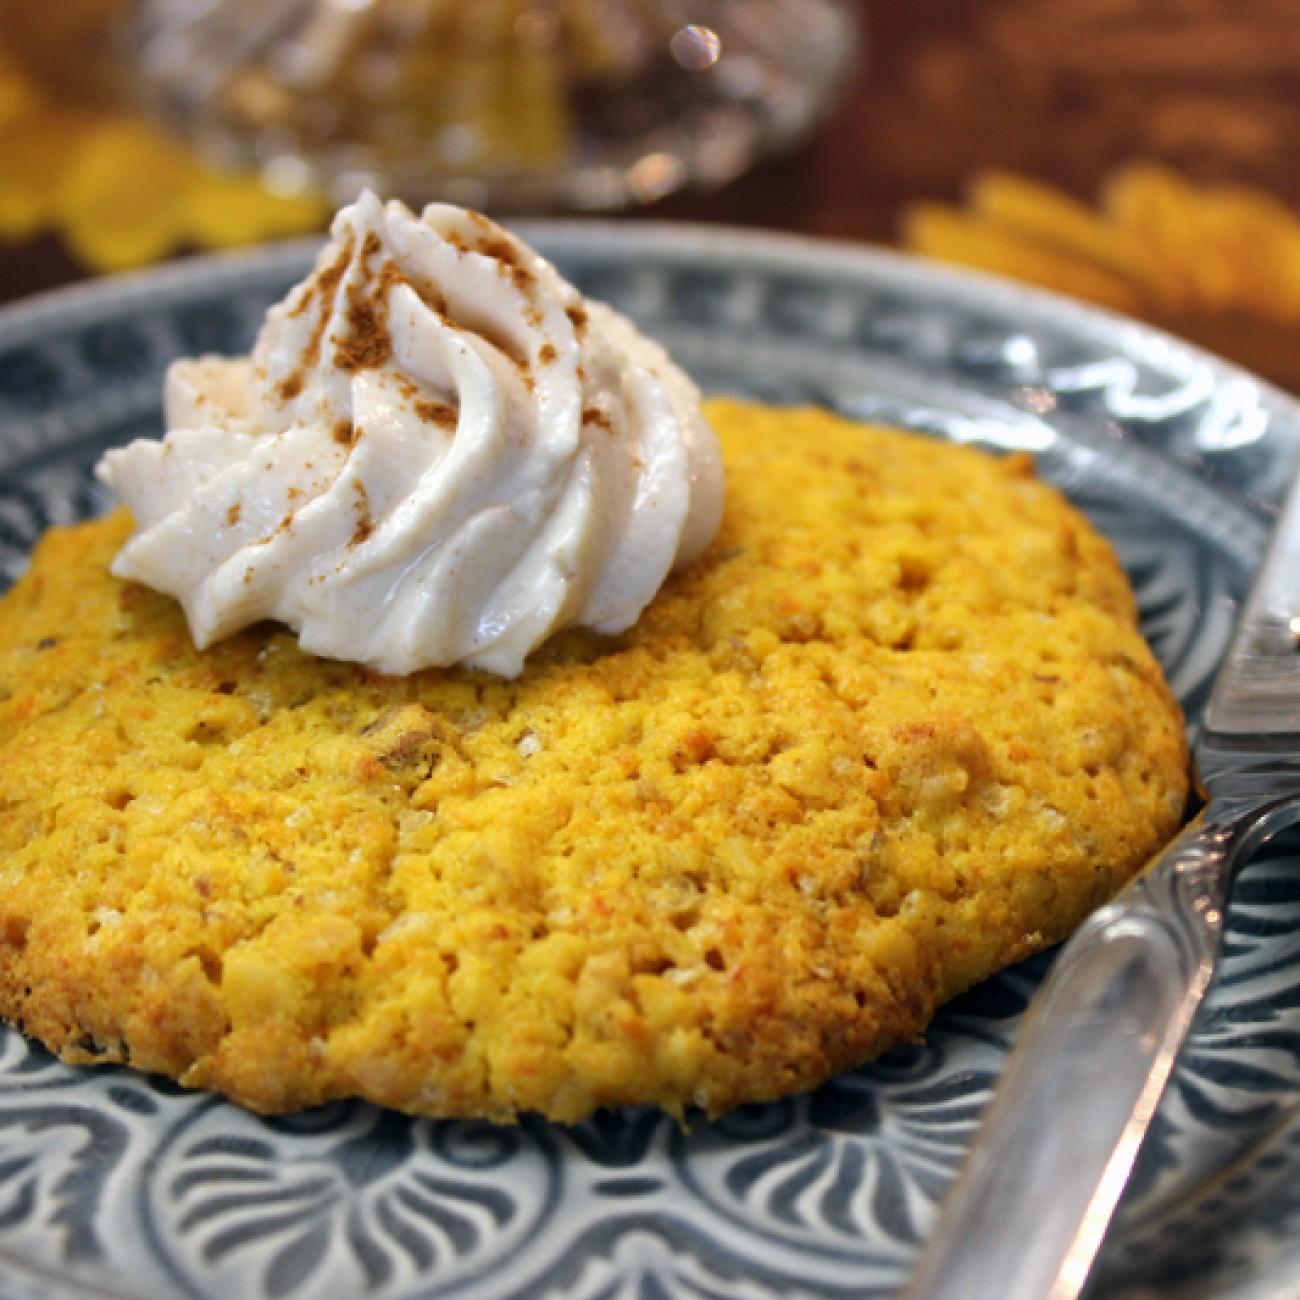 Kürbis-Nusswhookies mit Frischkäse-Zimt Creme